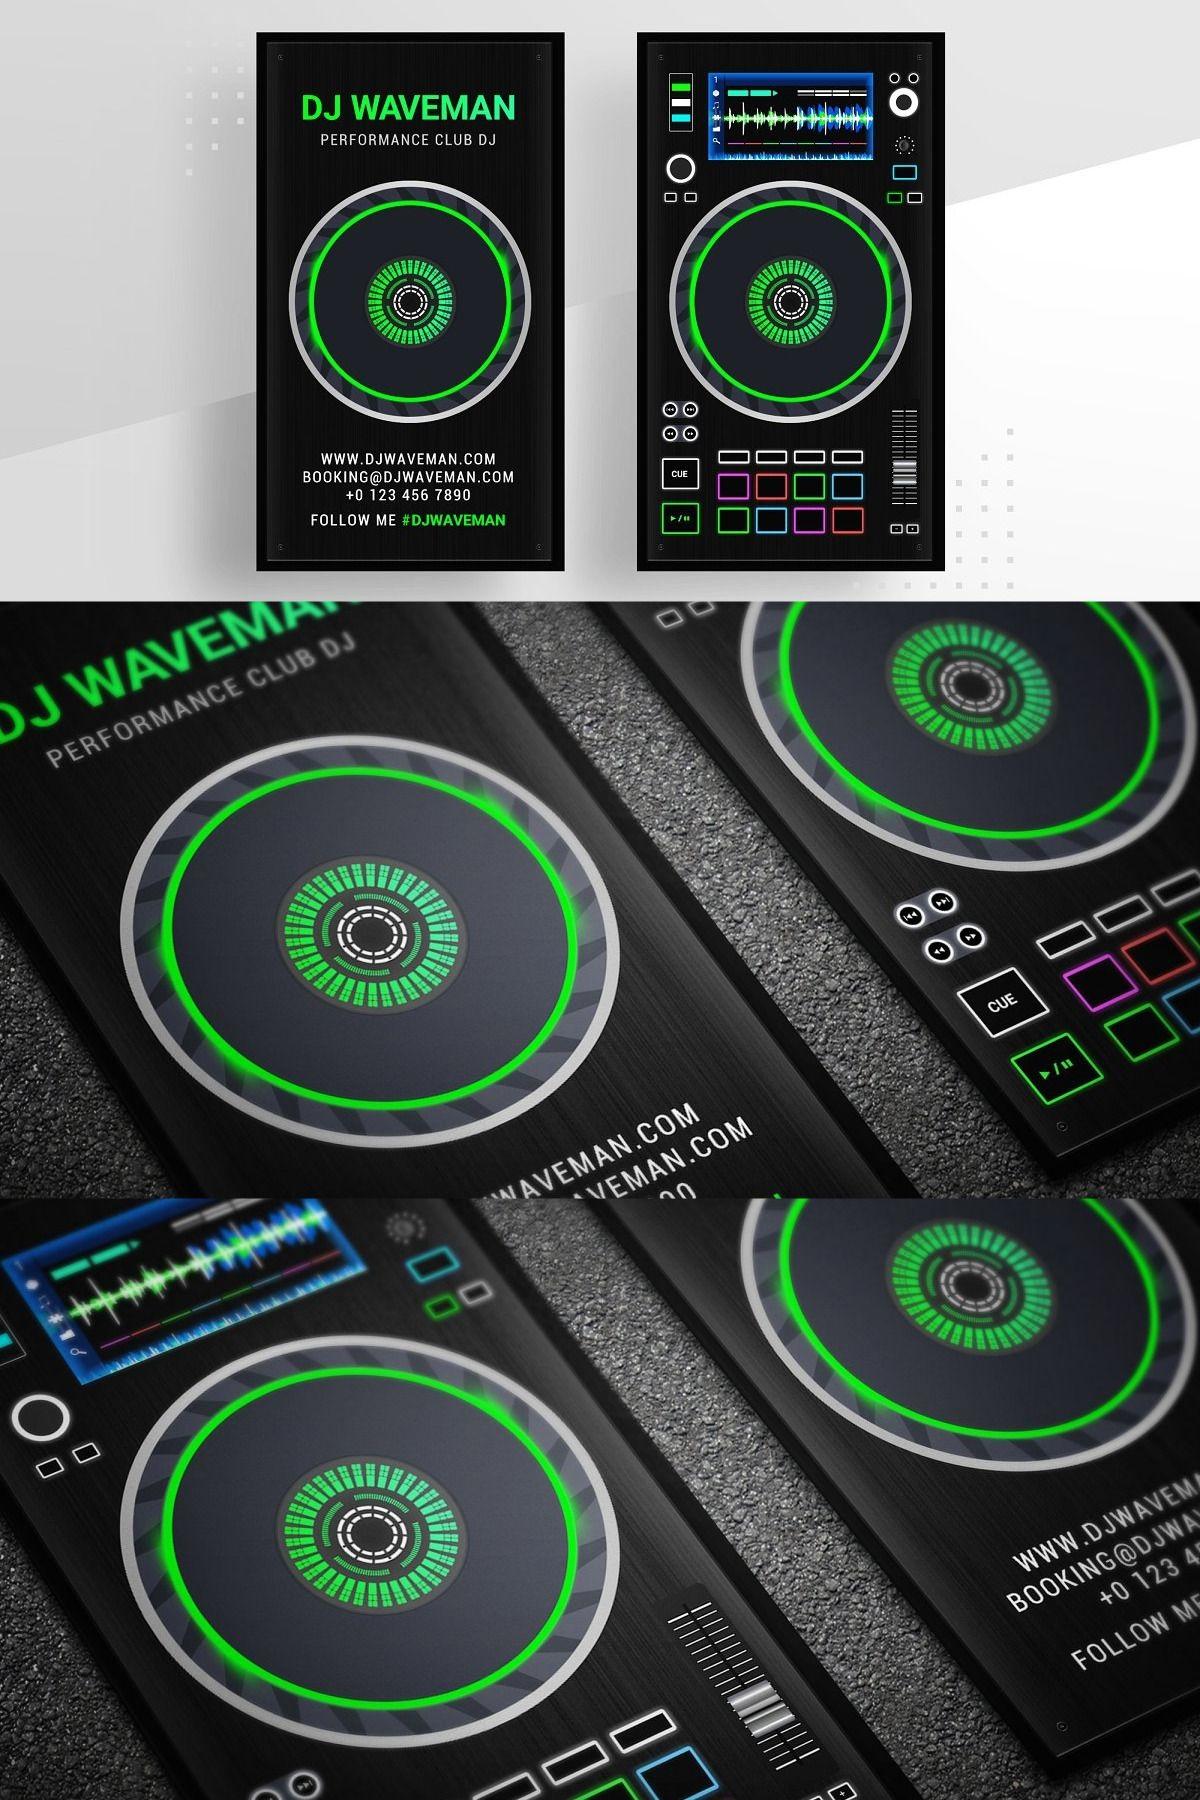 002 Remarkable Dj Busines Card Template High Resolution  Psd Free DownloadFull